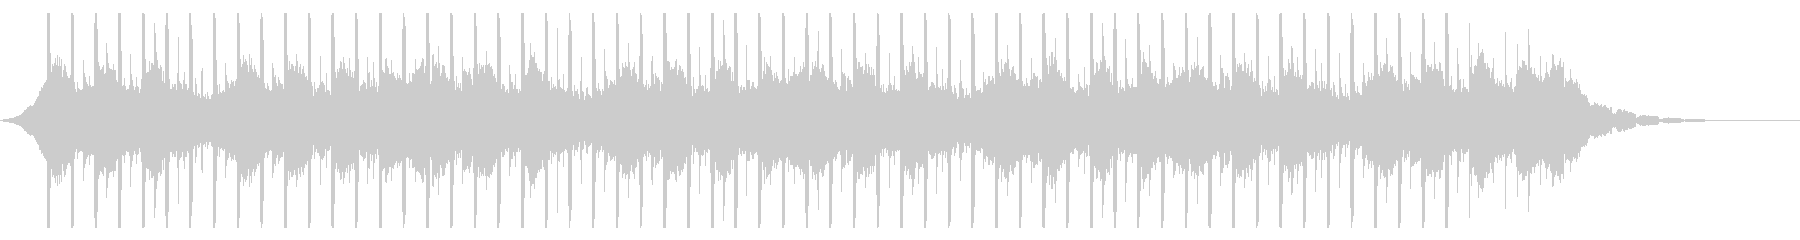 The Construction (40 Sec)'s unreproduced waveform